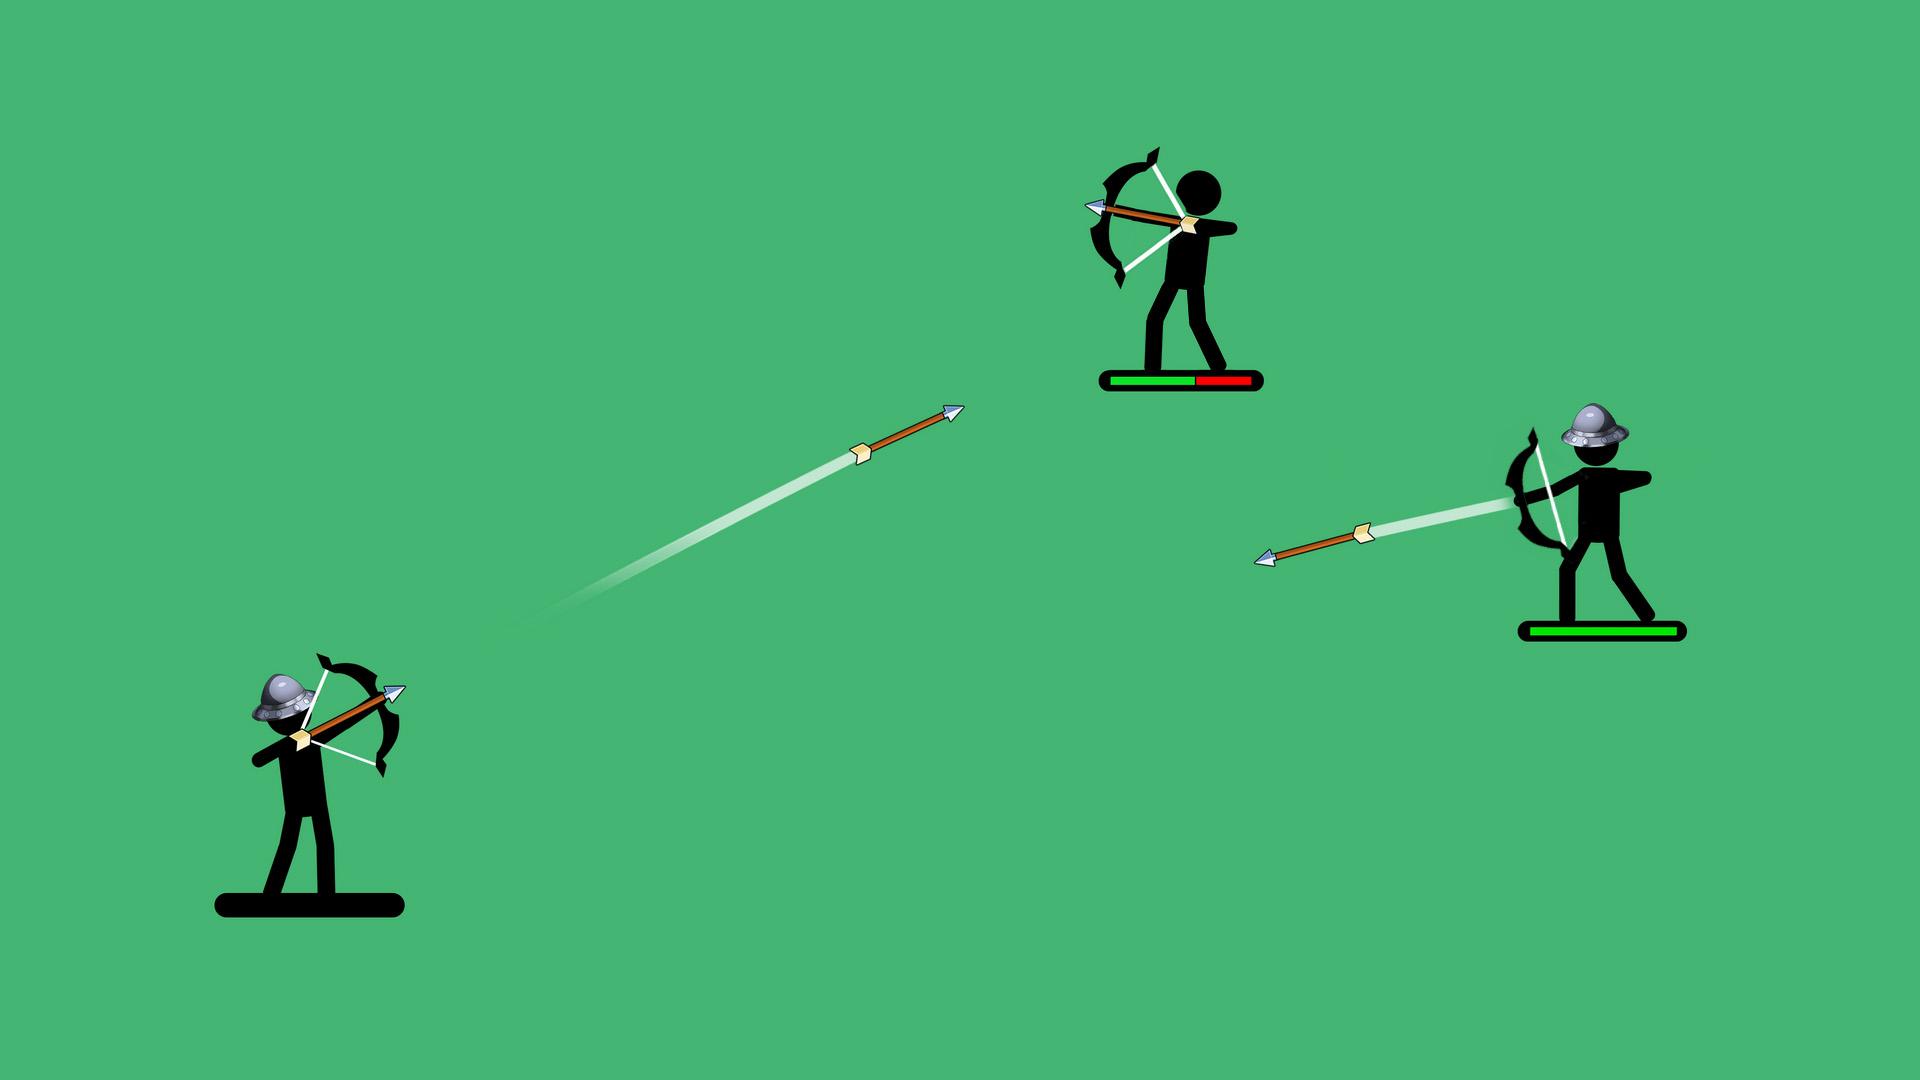 The Archers 2 screenshot 2021